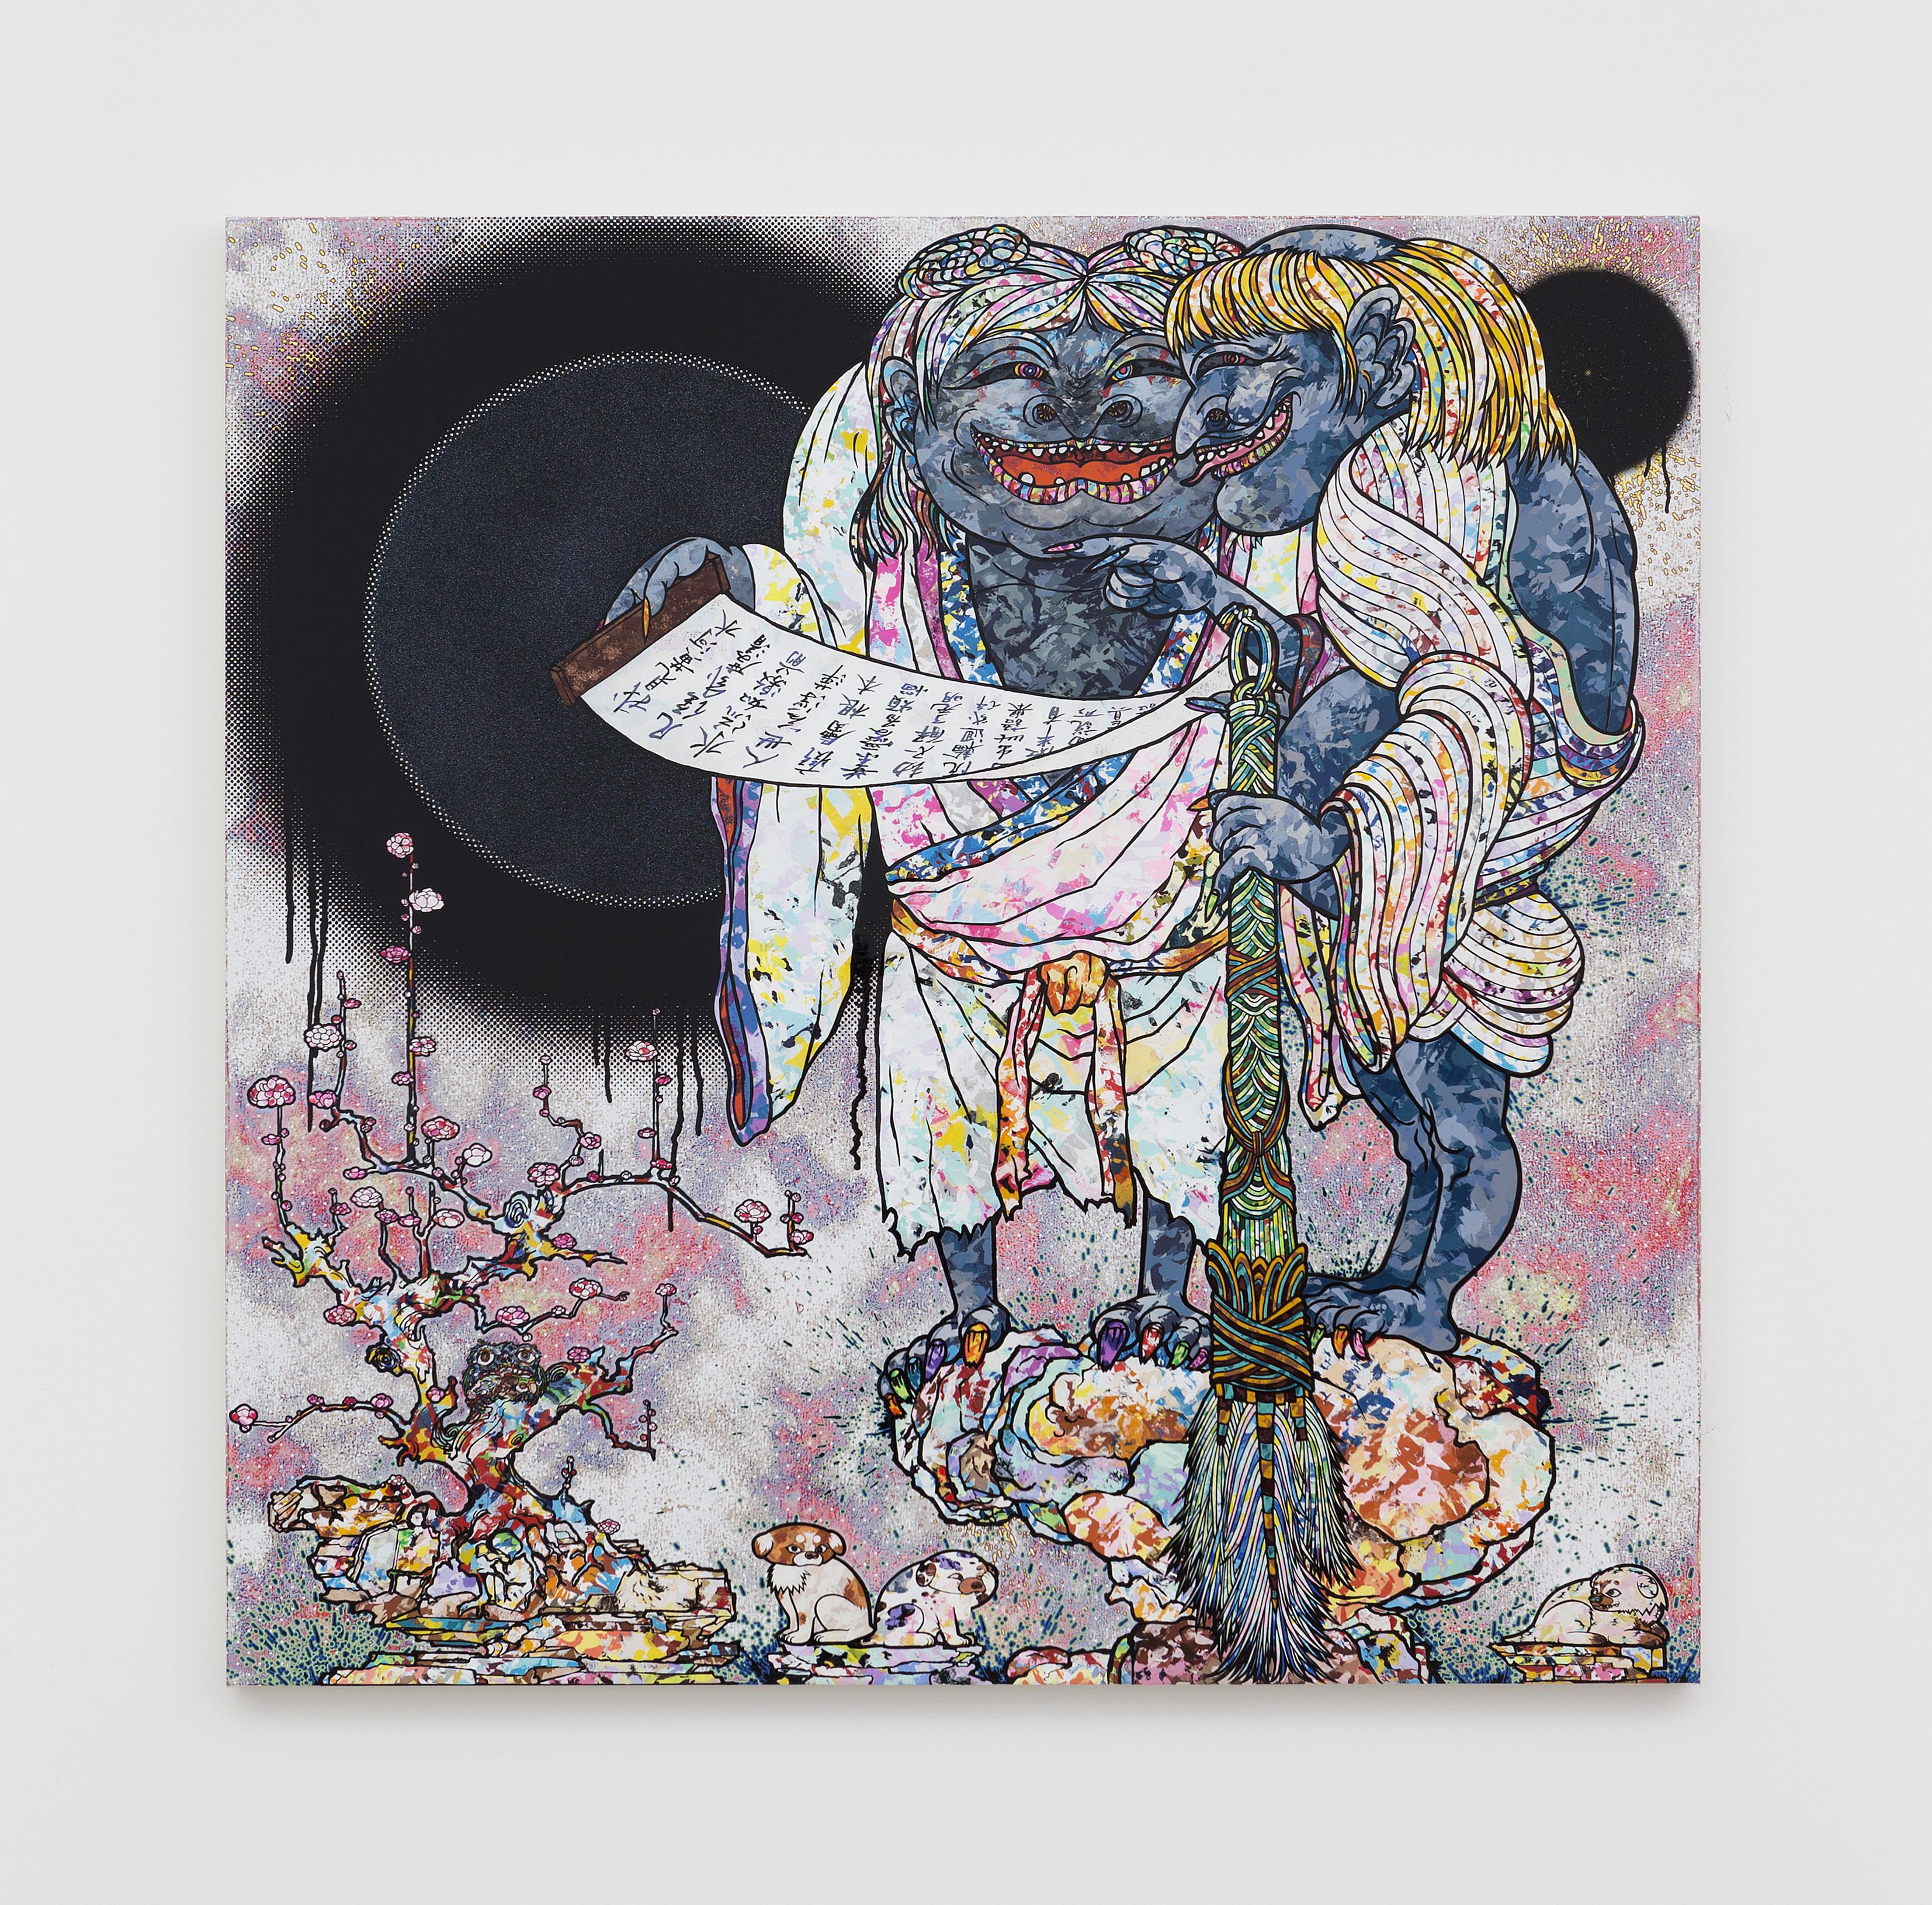 Takashi Murakami Title to Be Determined(2016). Acrylique sur toile montée sur châssis en aluminium. © 2016 Takashi Murakami/Kaikai Kiki Co., Ltd. Tous droits réservés. Photo : Claire Dorn. Courtesy ofGalerie Perrotin